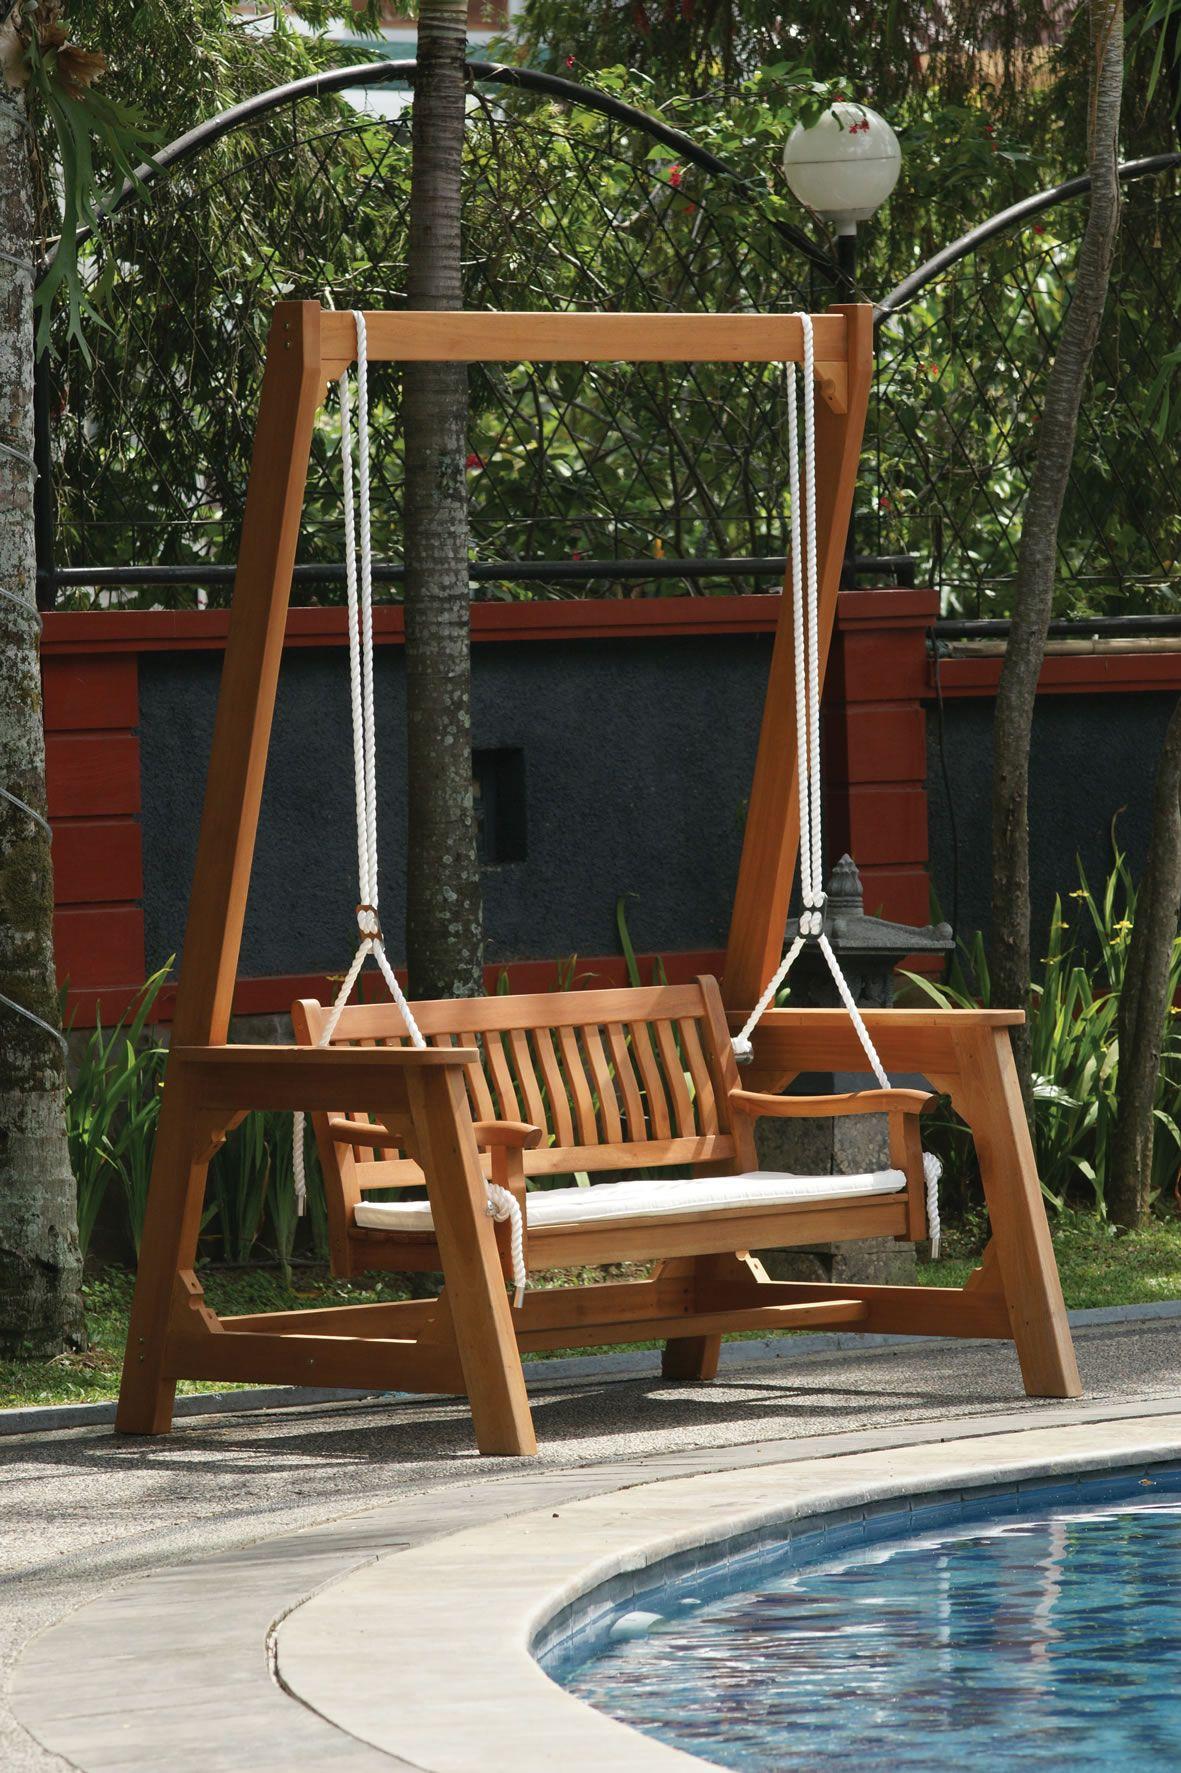 Garden Swings: The Enchanting Element in Your Backyard | Interiors ...